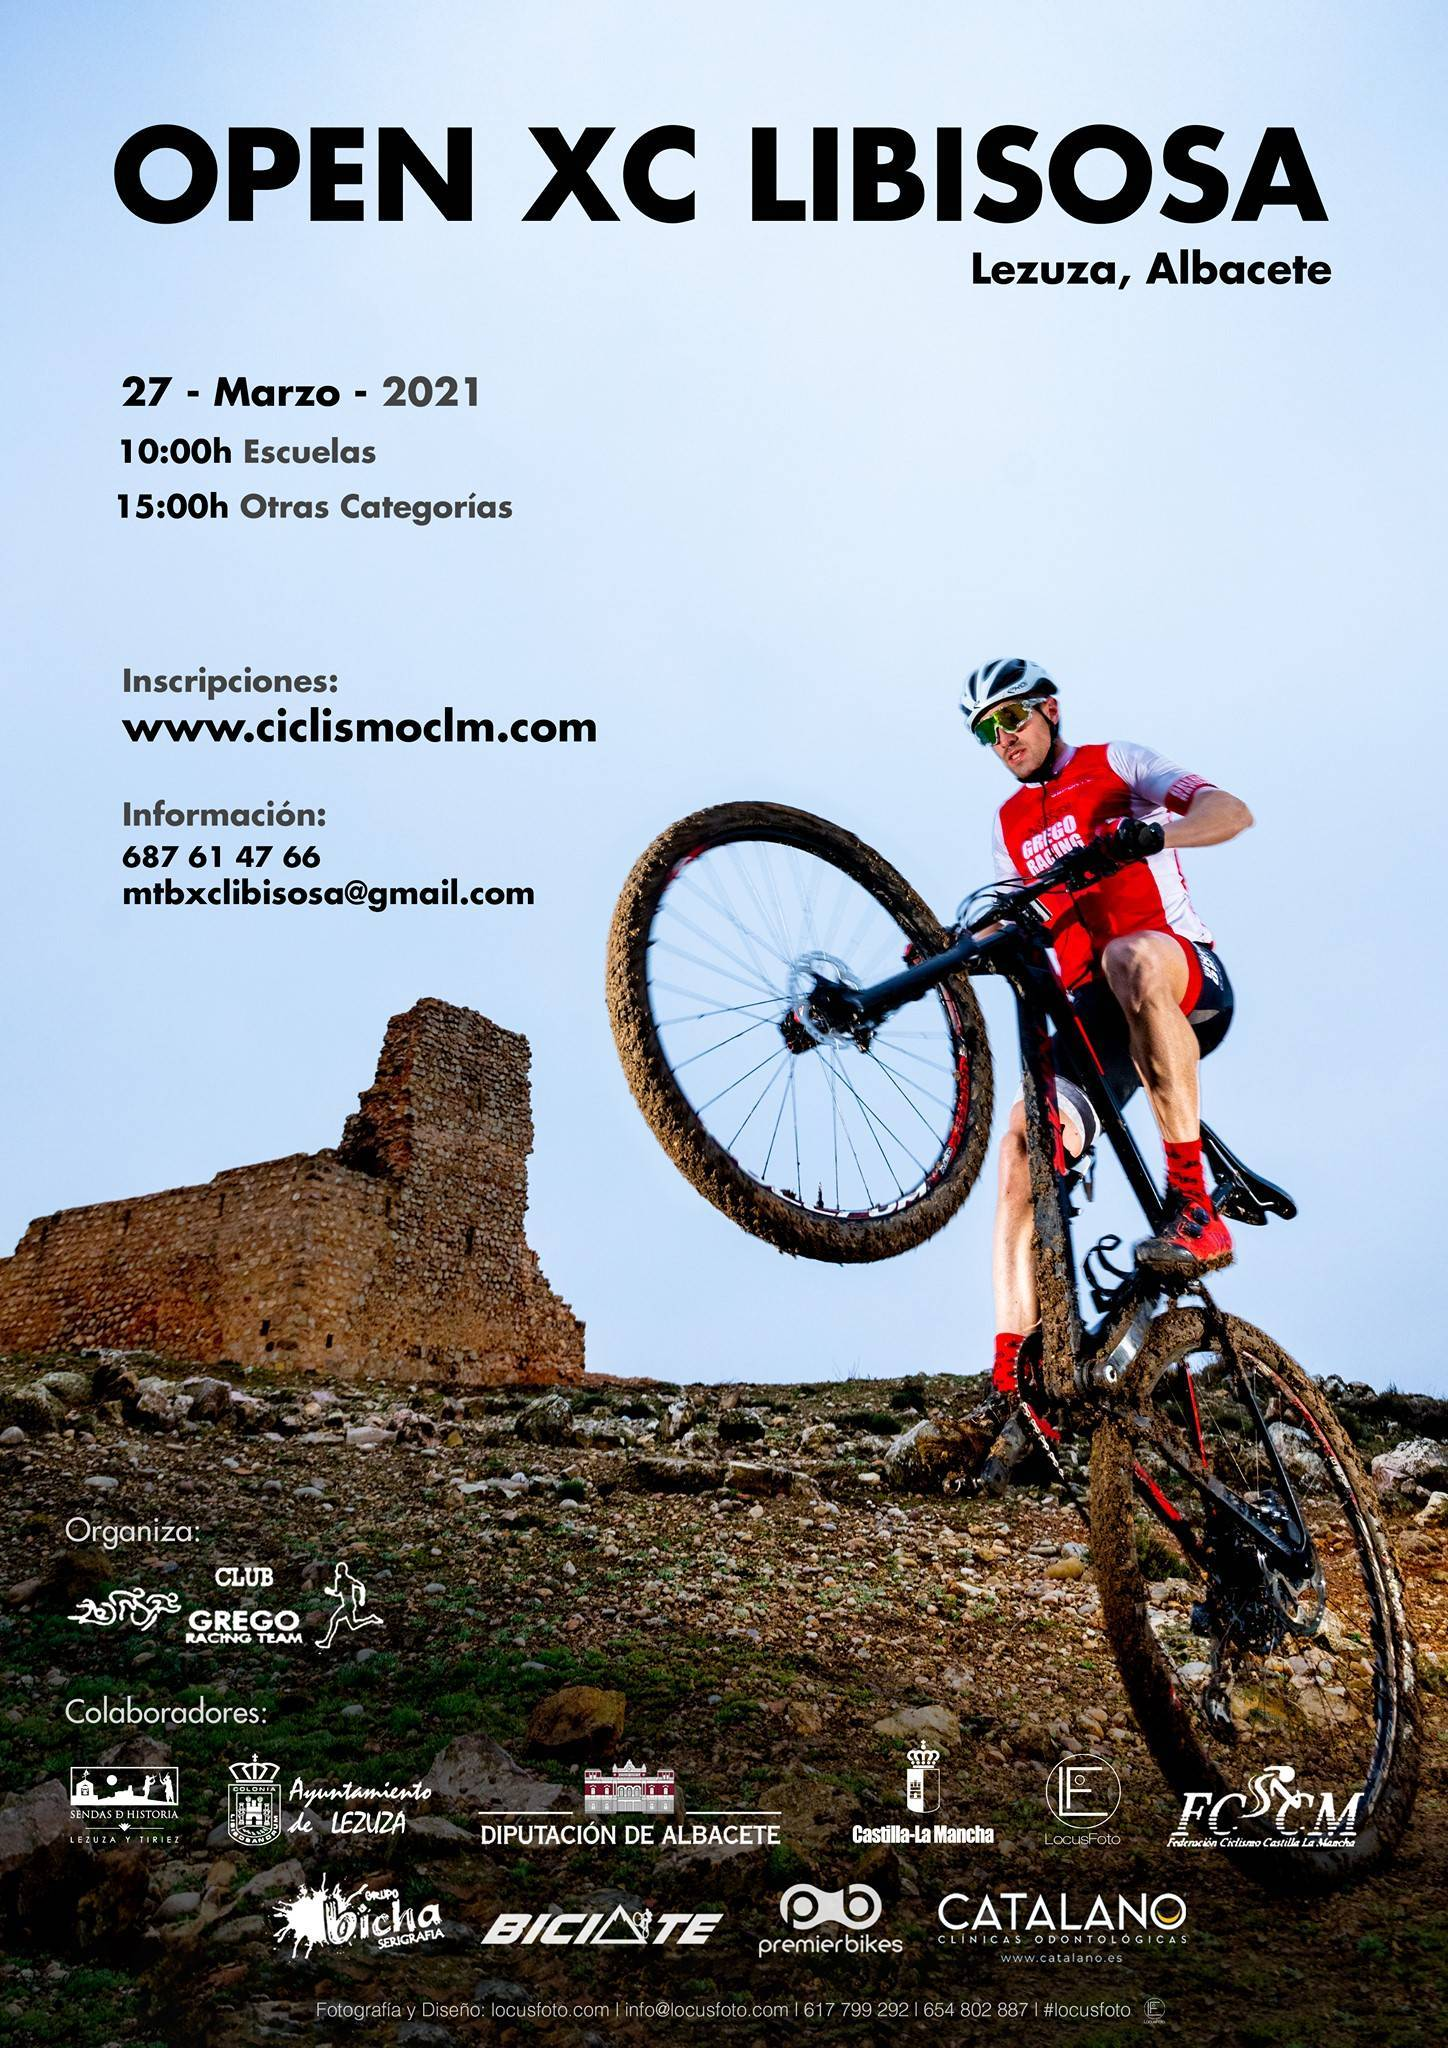 Open XC Libisosa - Lezuza (Albacete)